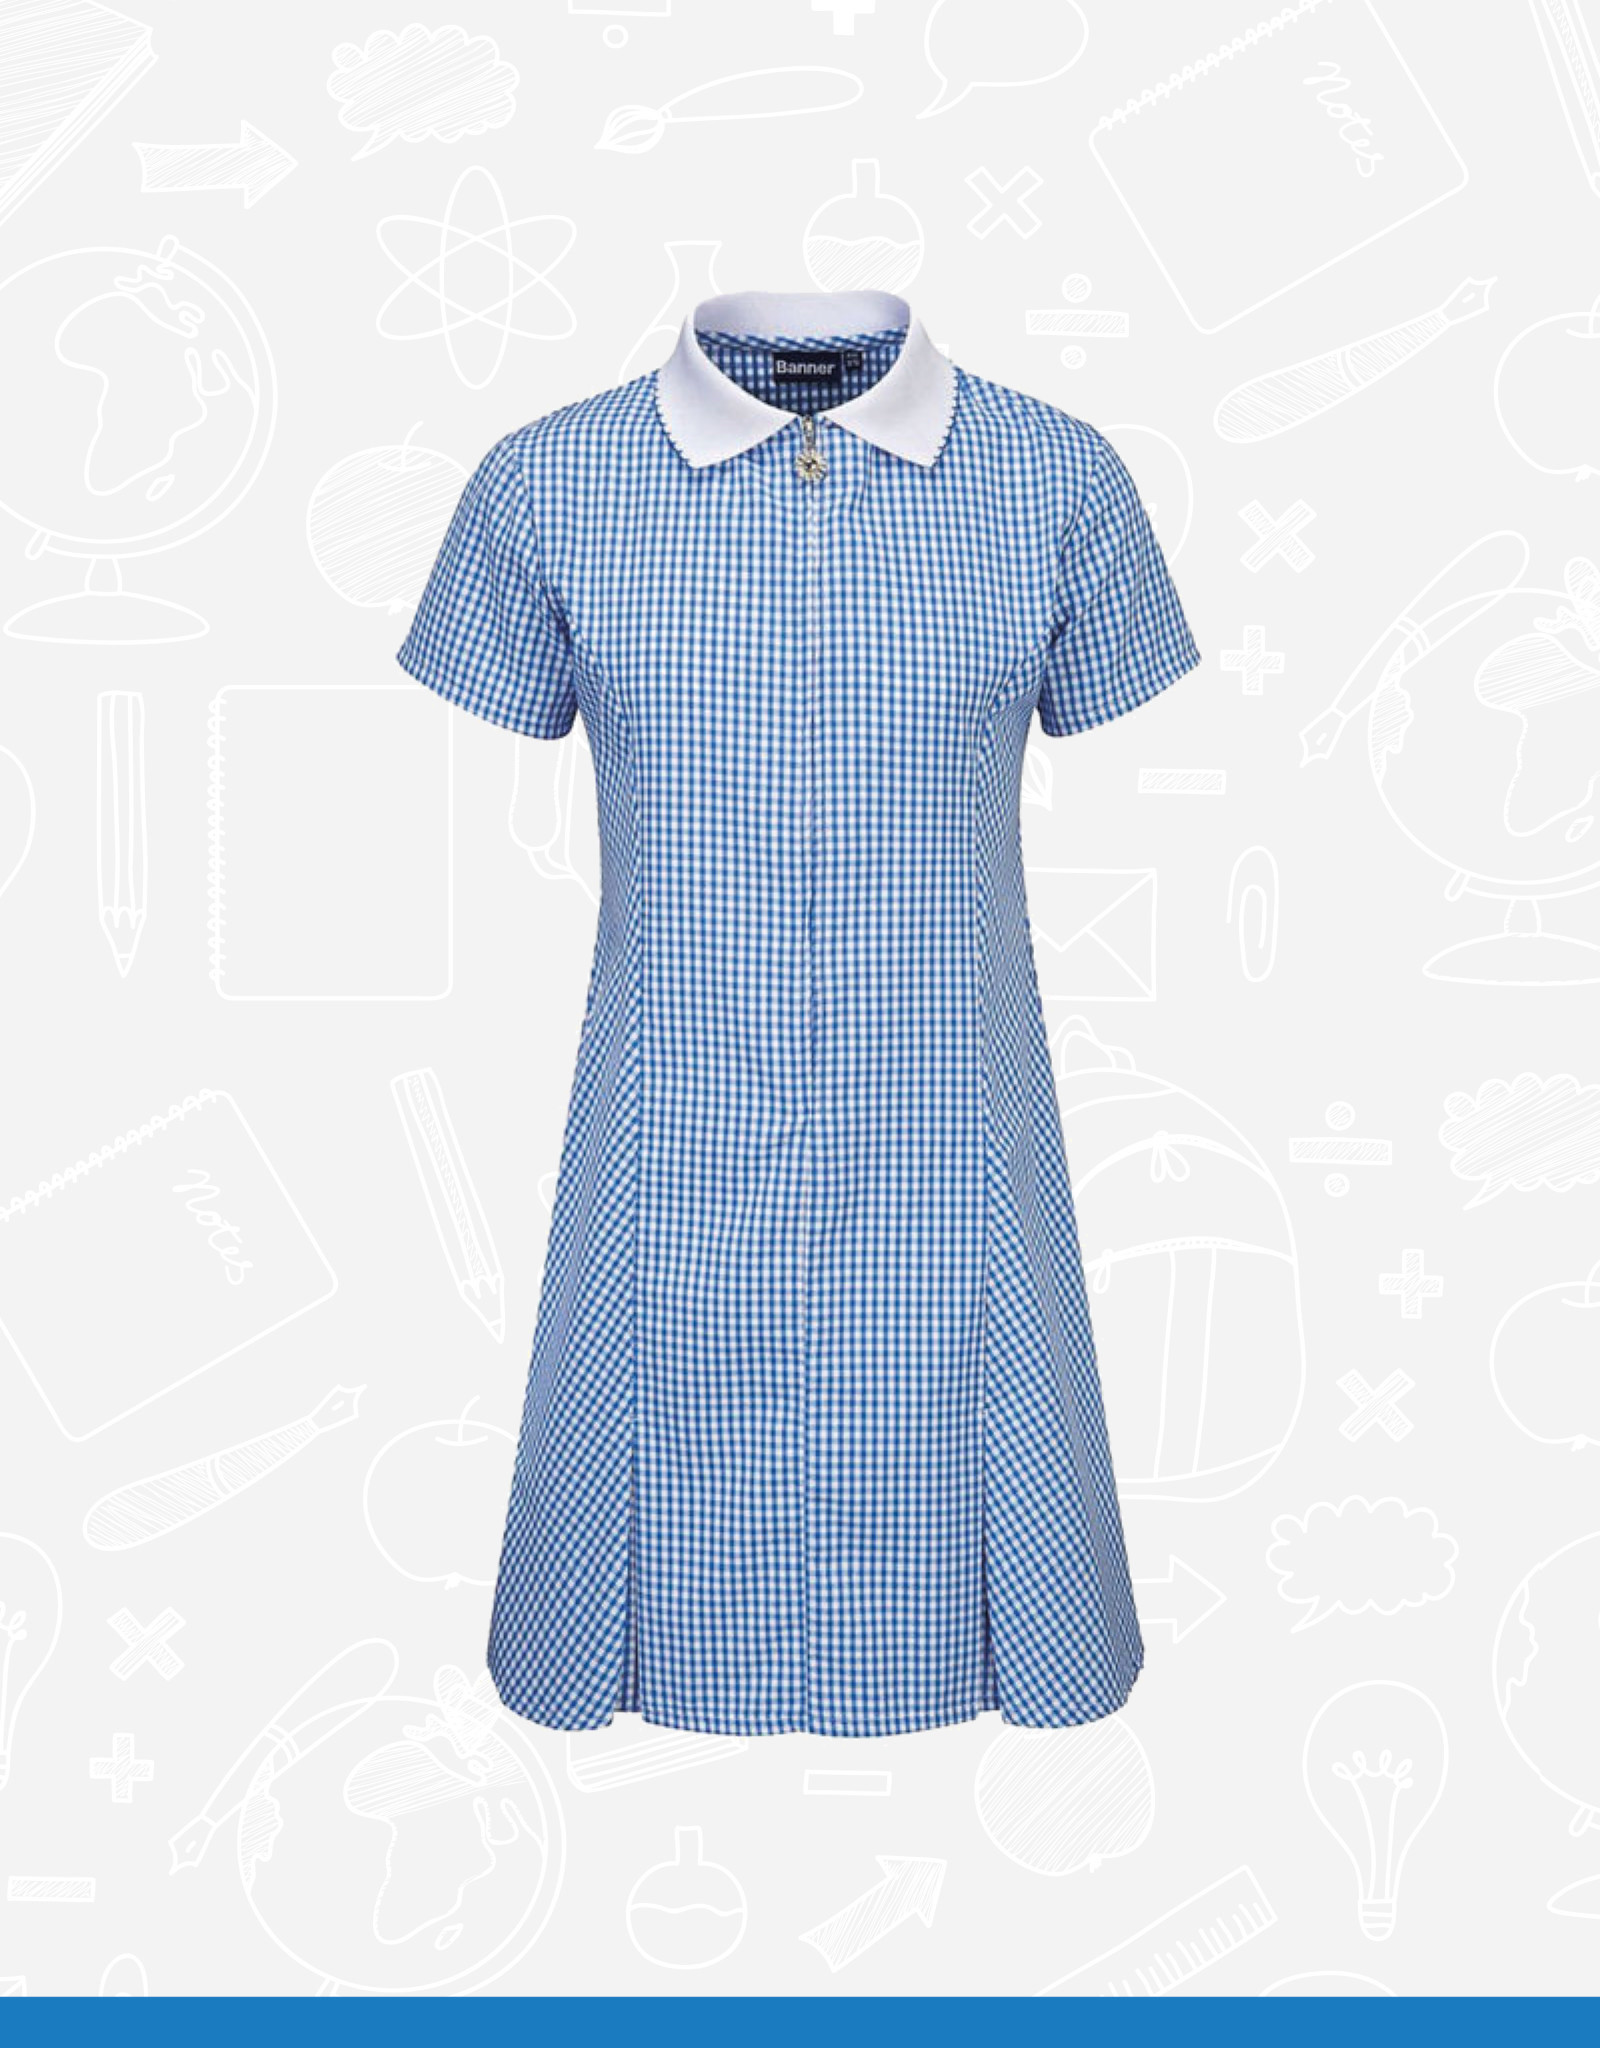 Banner Avon Zip Gingham Dress (913104)